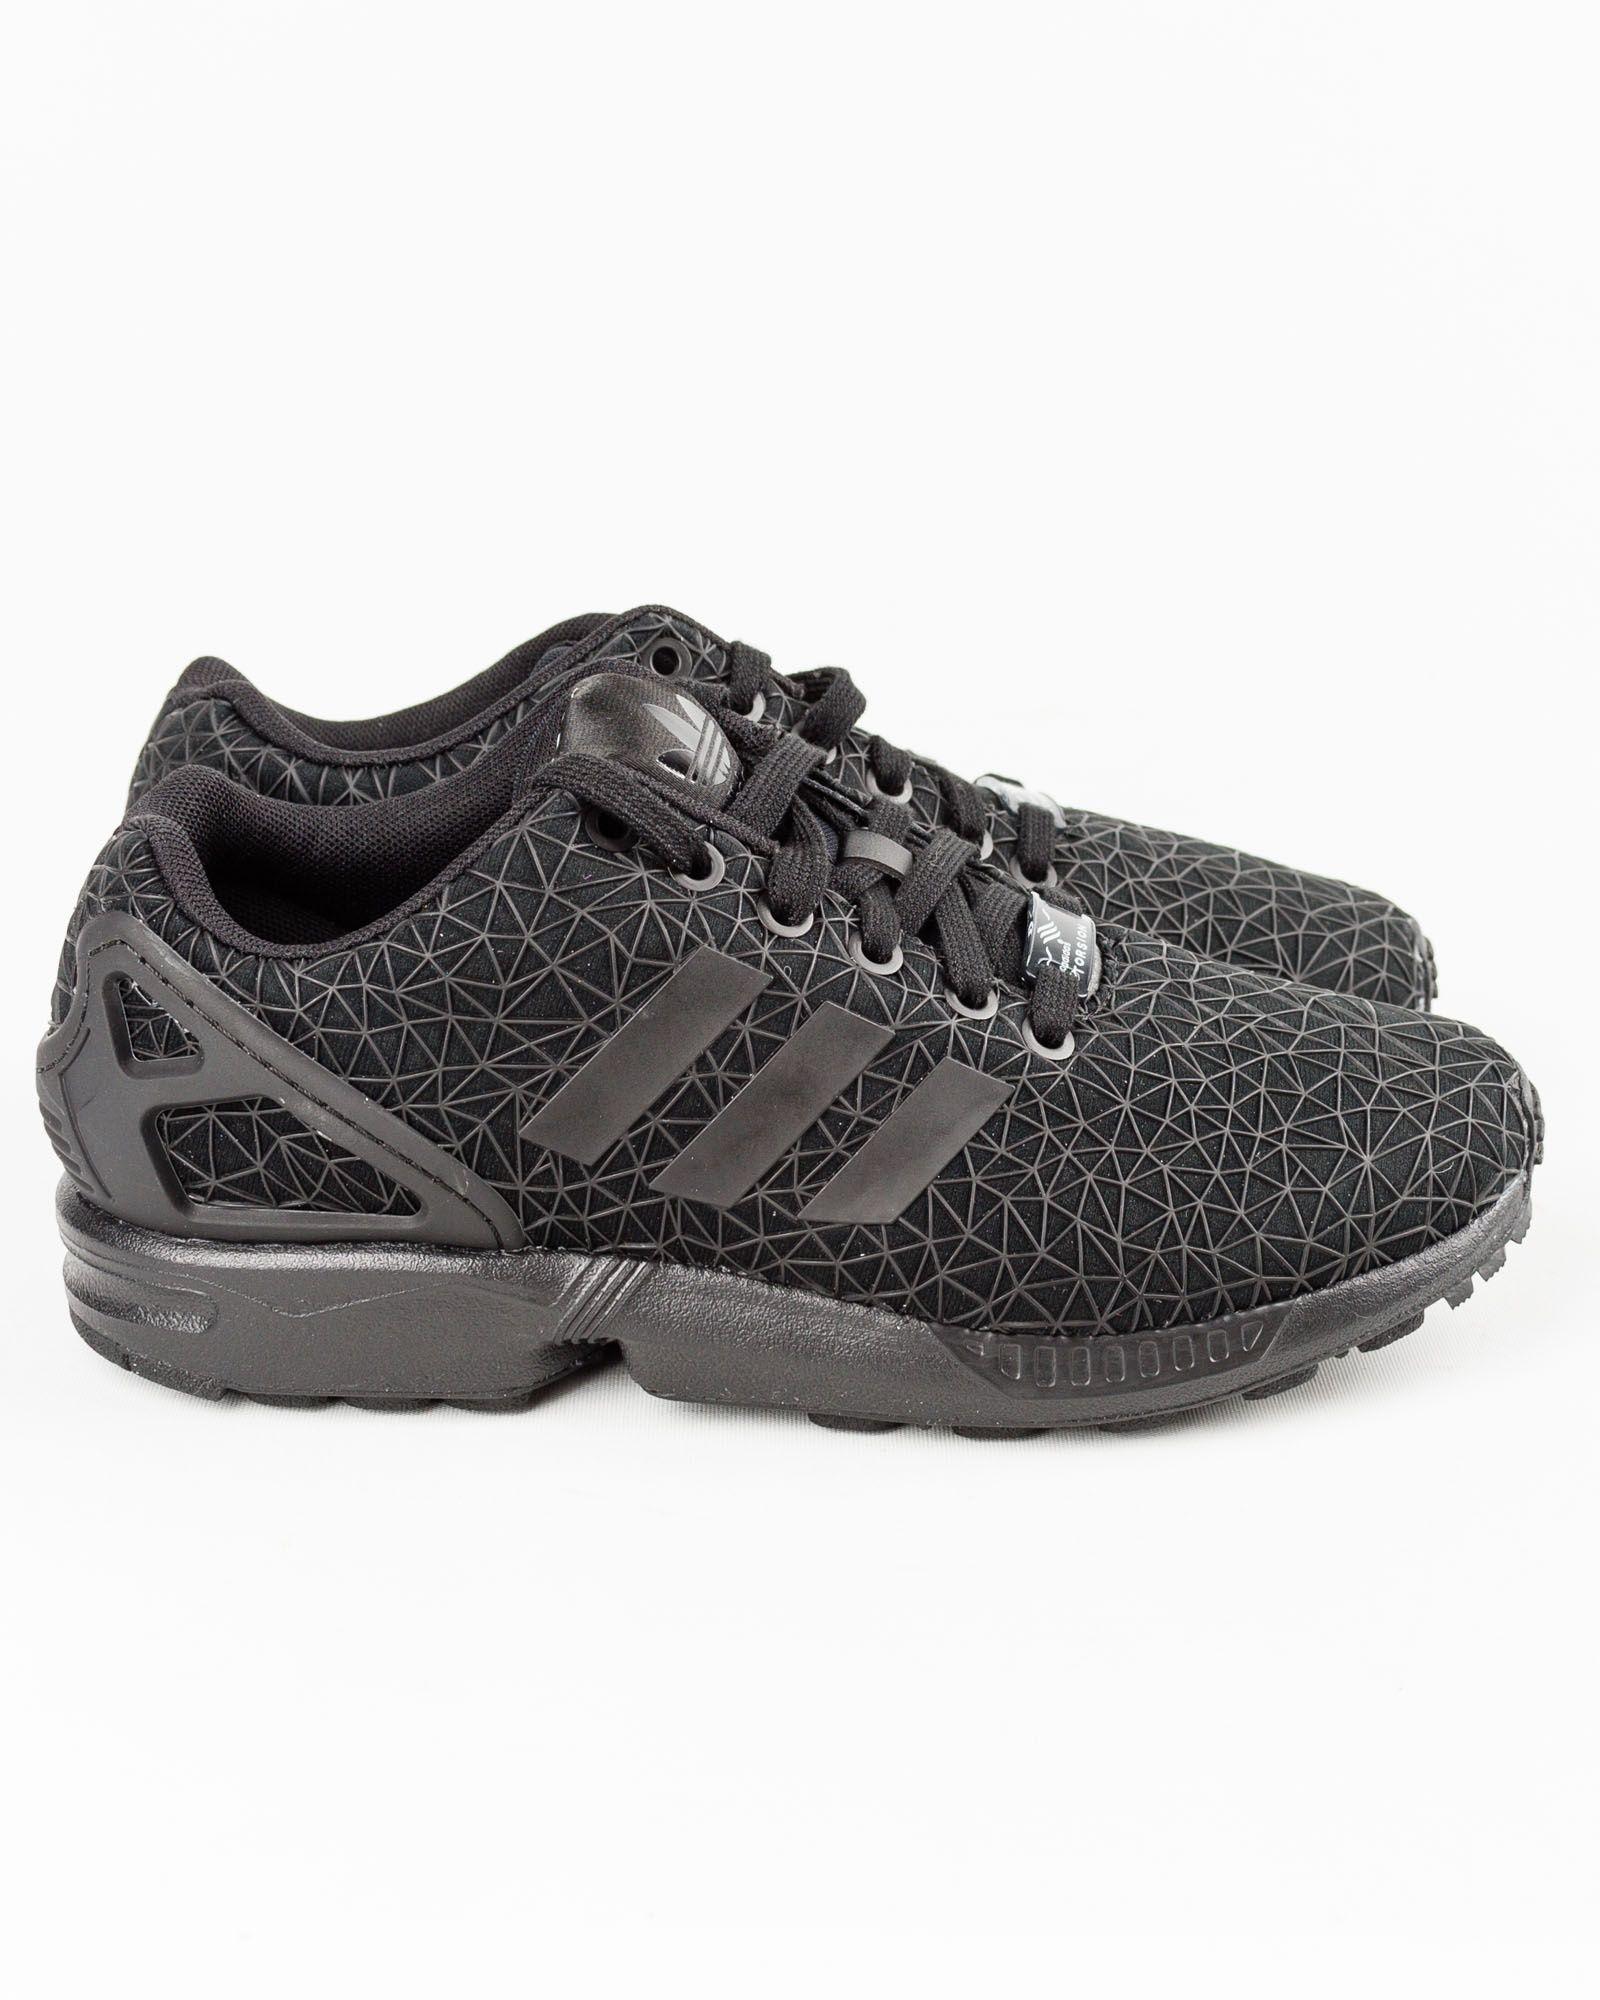 meilleure sélection 31199 29910 Sneakers Zx Flux Noir Adidas - Majestic | Adidas | Sneakers ...